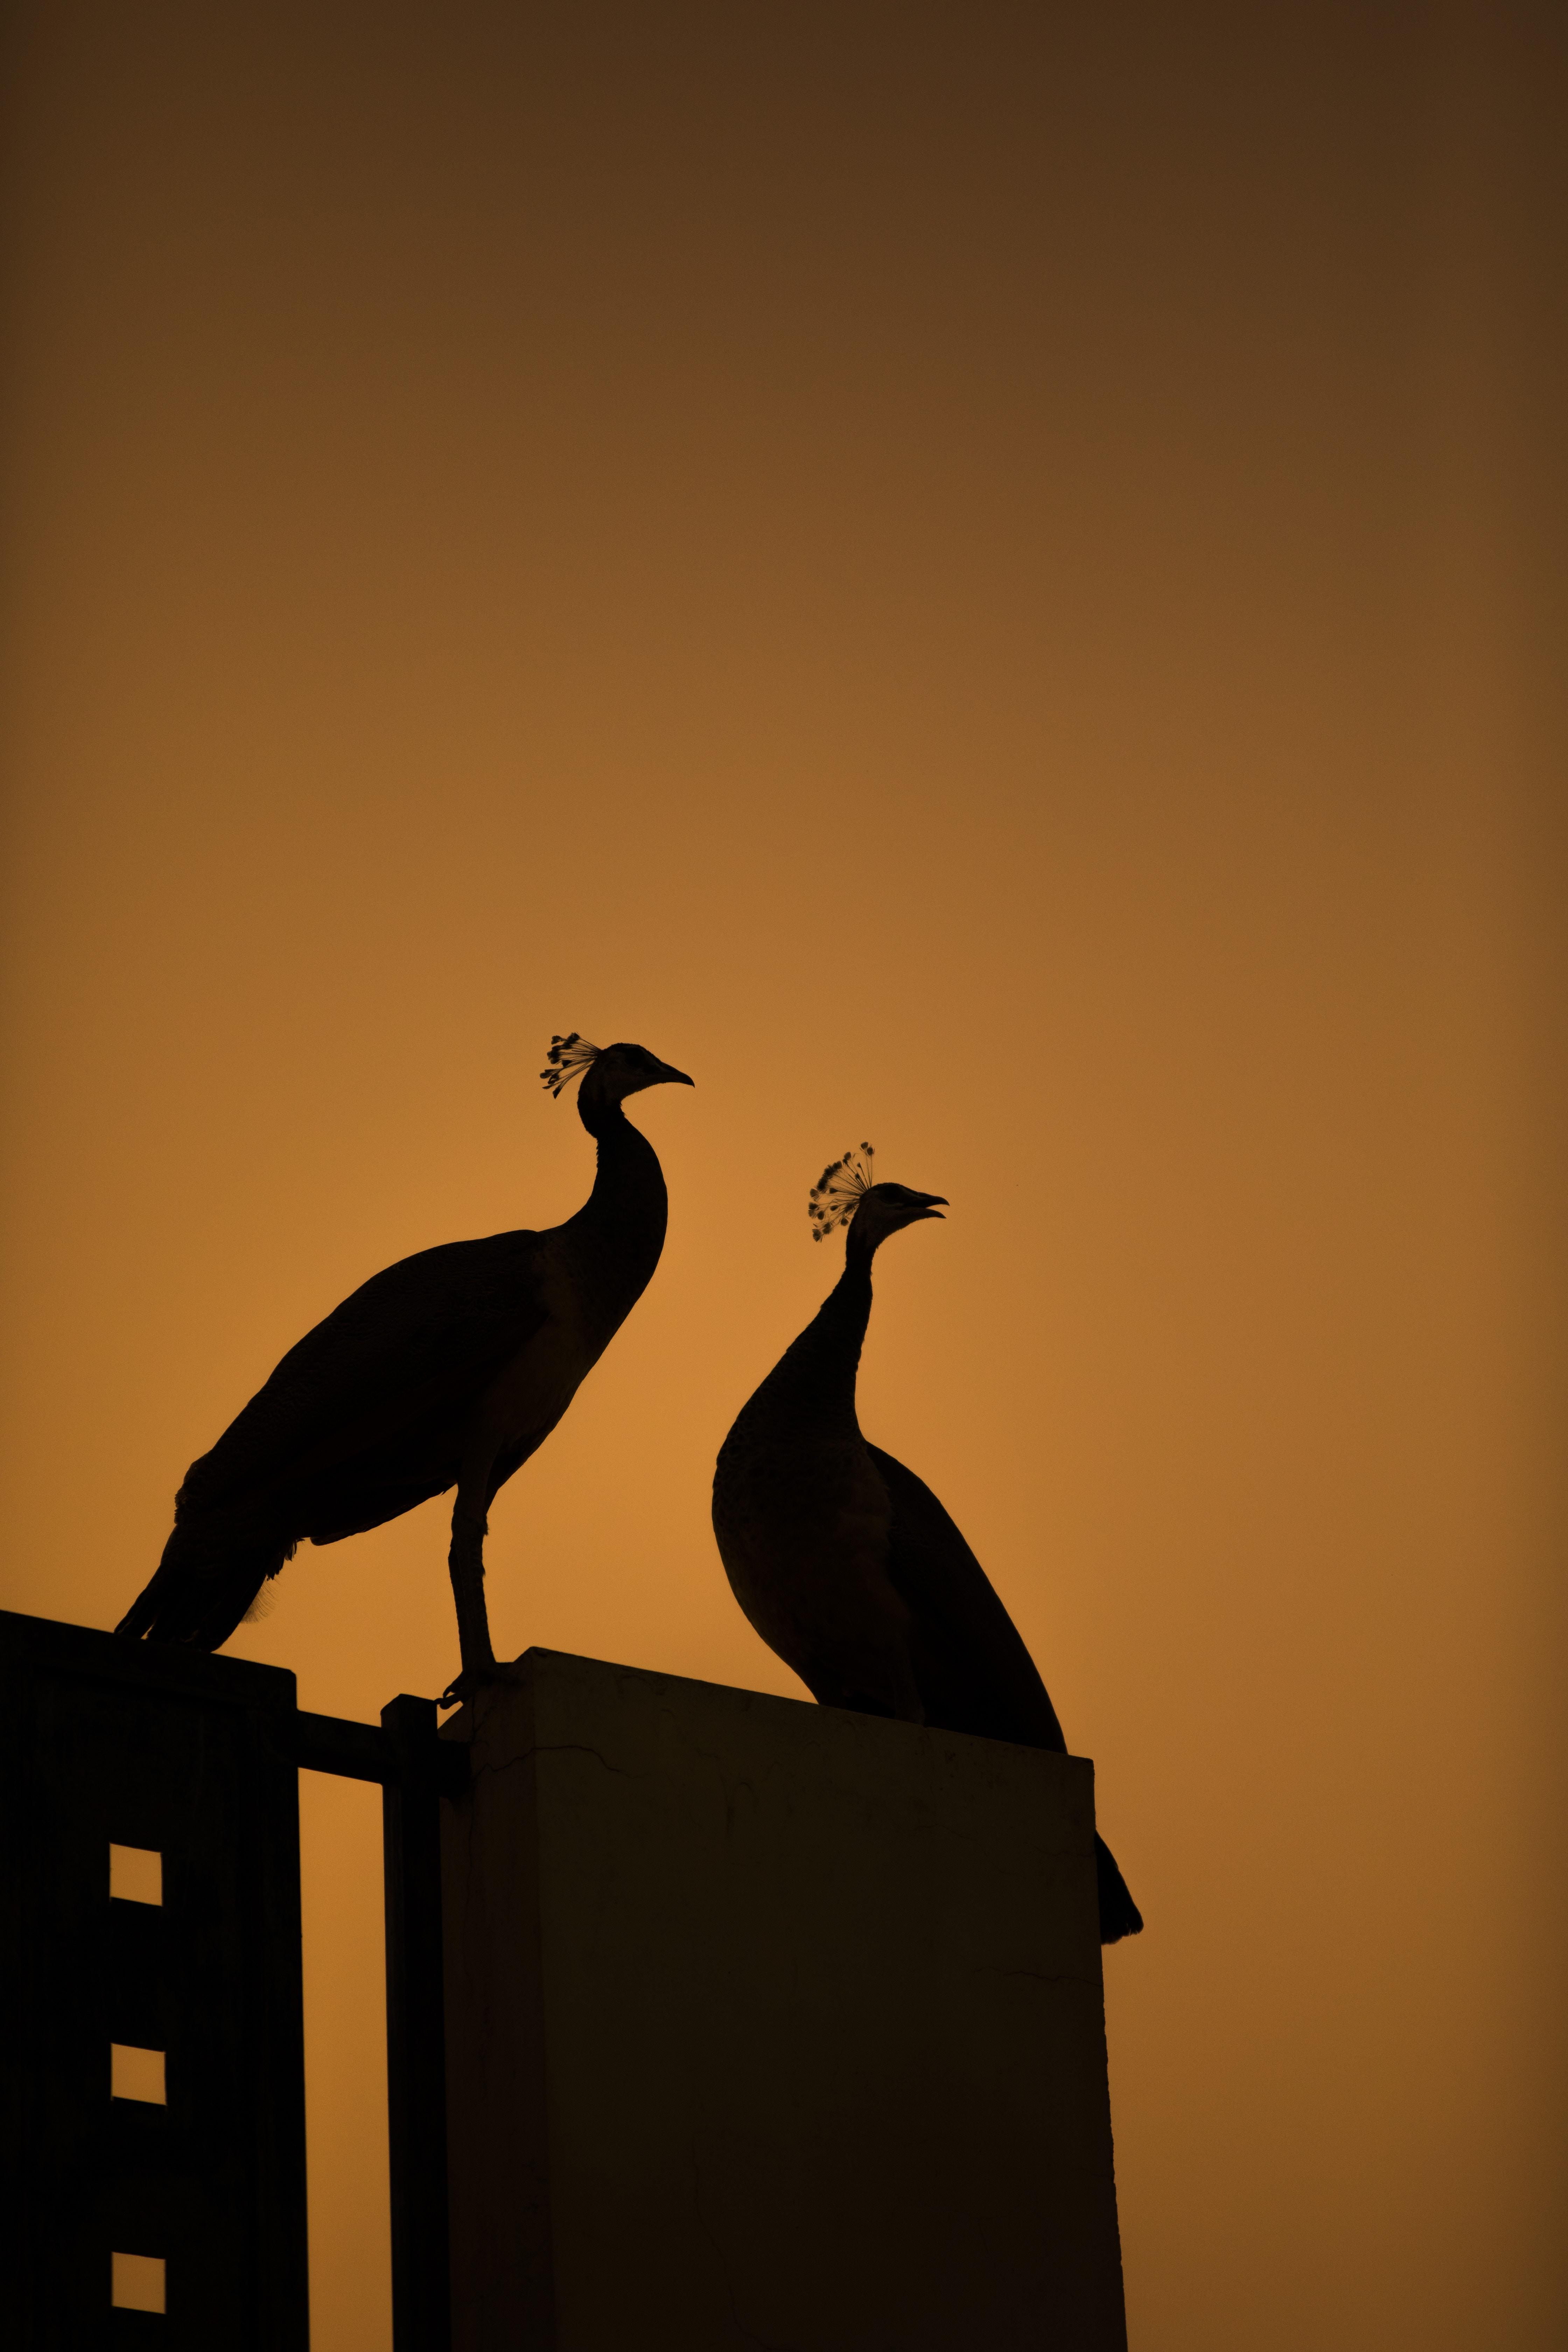 two peacocks shadow illustrations